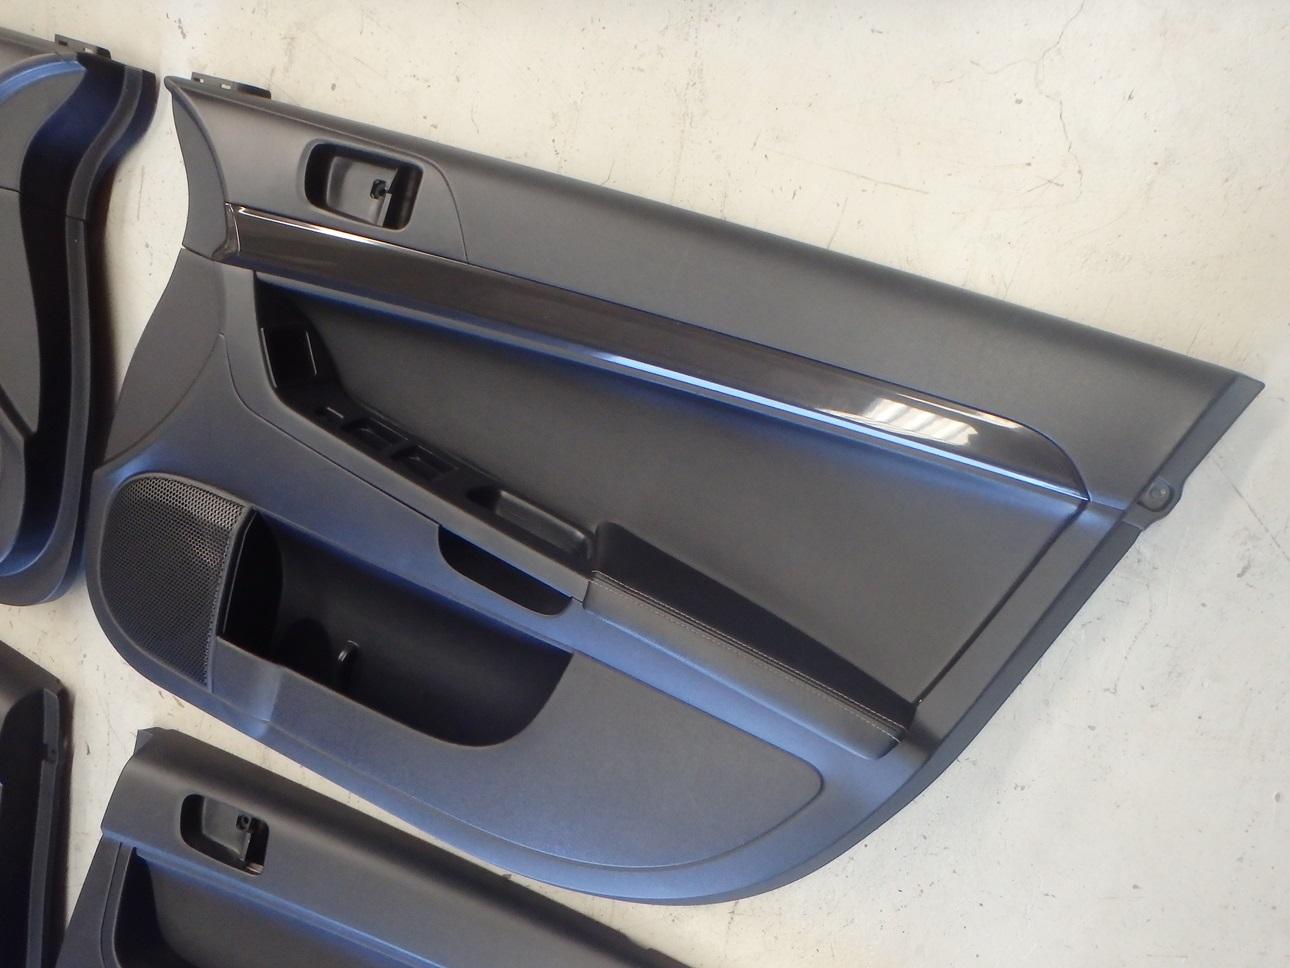 Mitsubishi Lancer Evo X 10 Cz4a Interior Door Card Panel Trim Set Leather Ebay